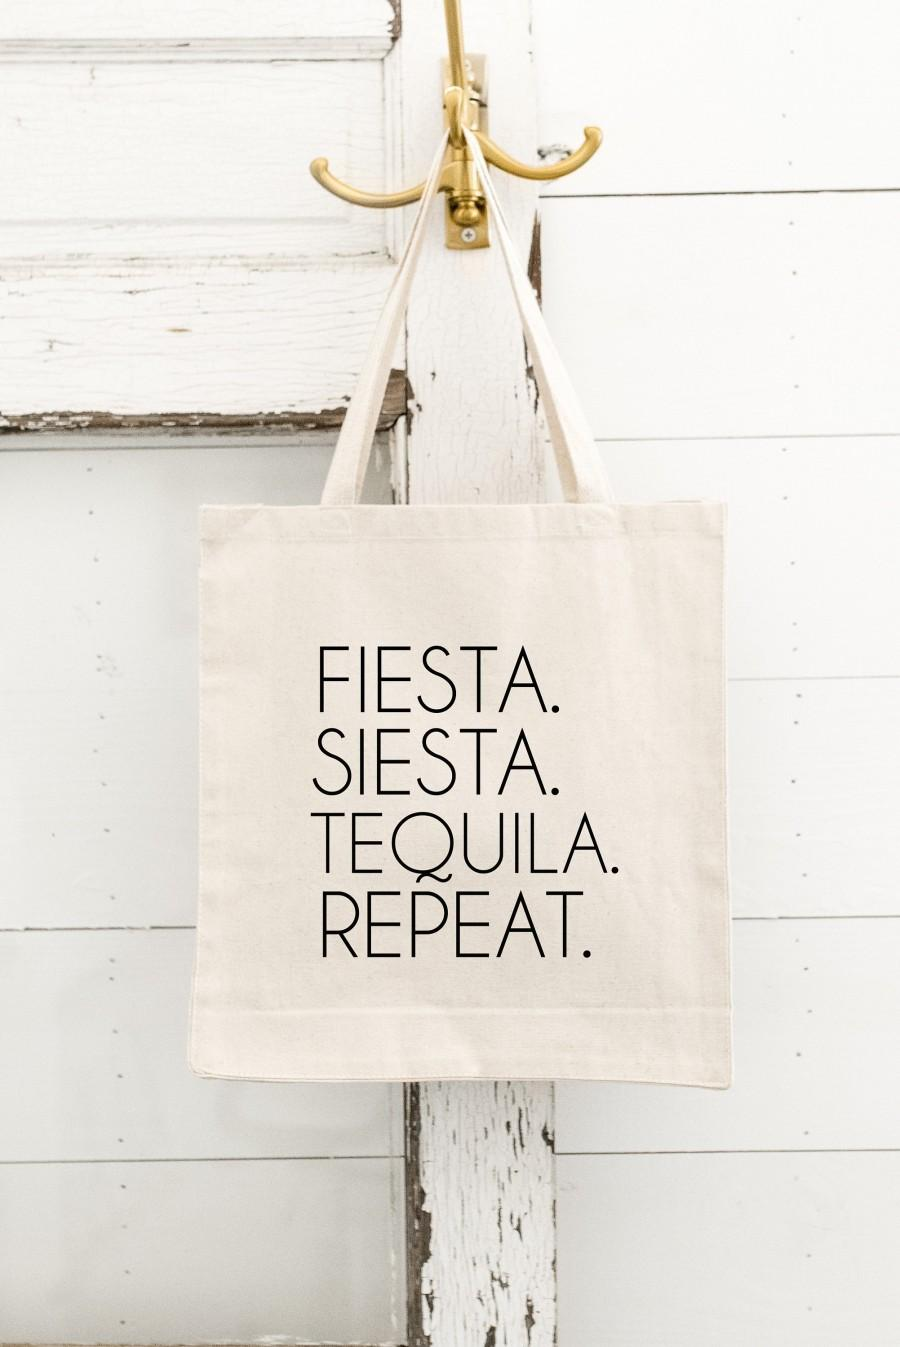 Wedding - Fiesta Siesta Tequila Repeat Tote - Fiesta Tote Bag - Bridesmaid Gift - Bridal Party Gift - Bachelorette Tote - Fiesta Bachelorette Party